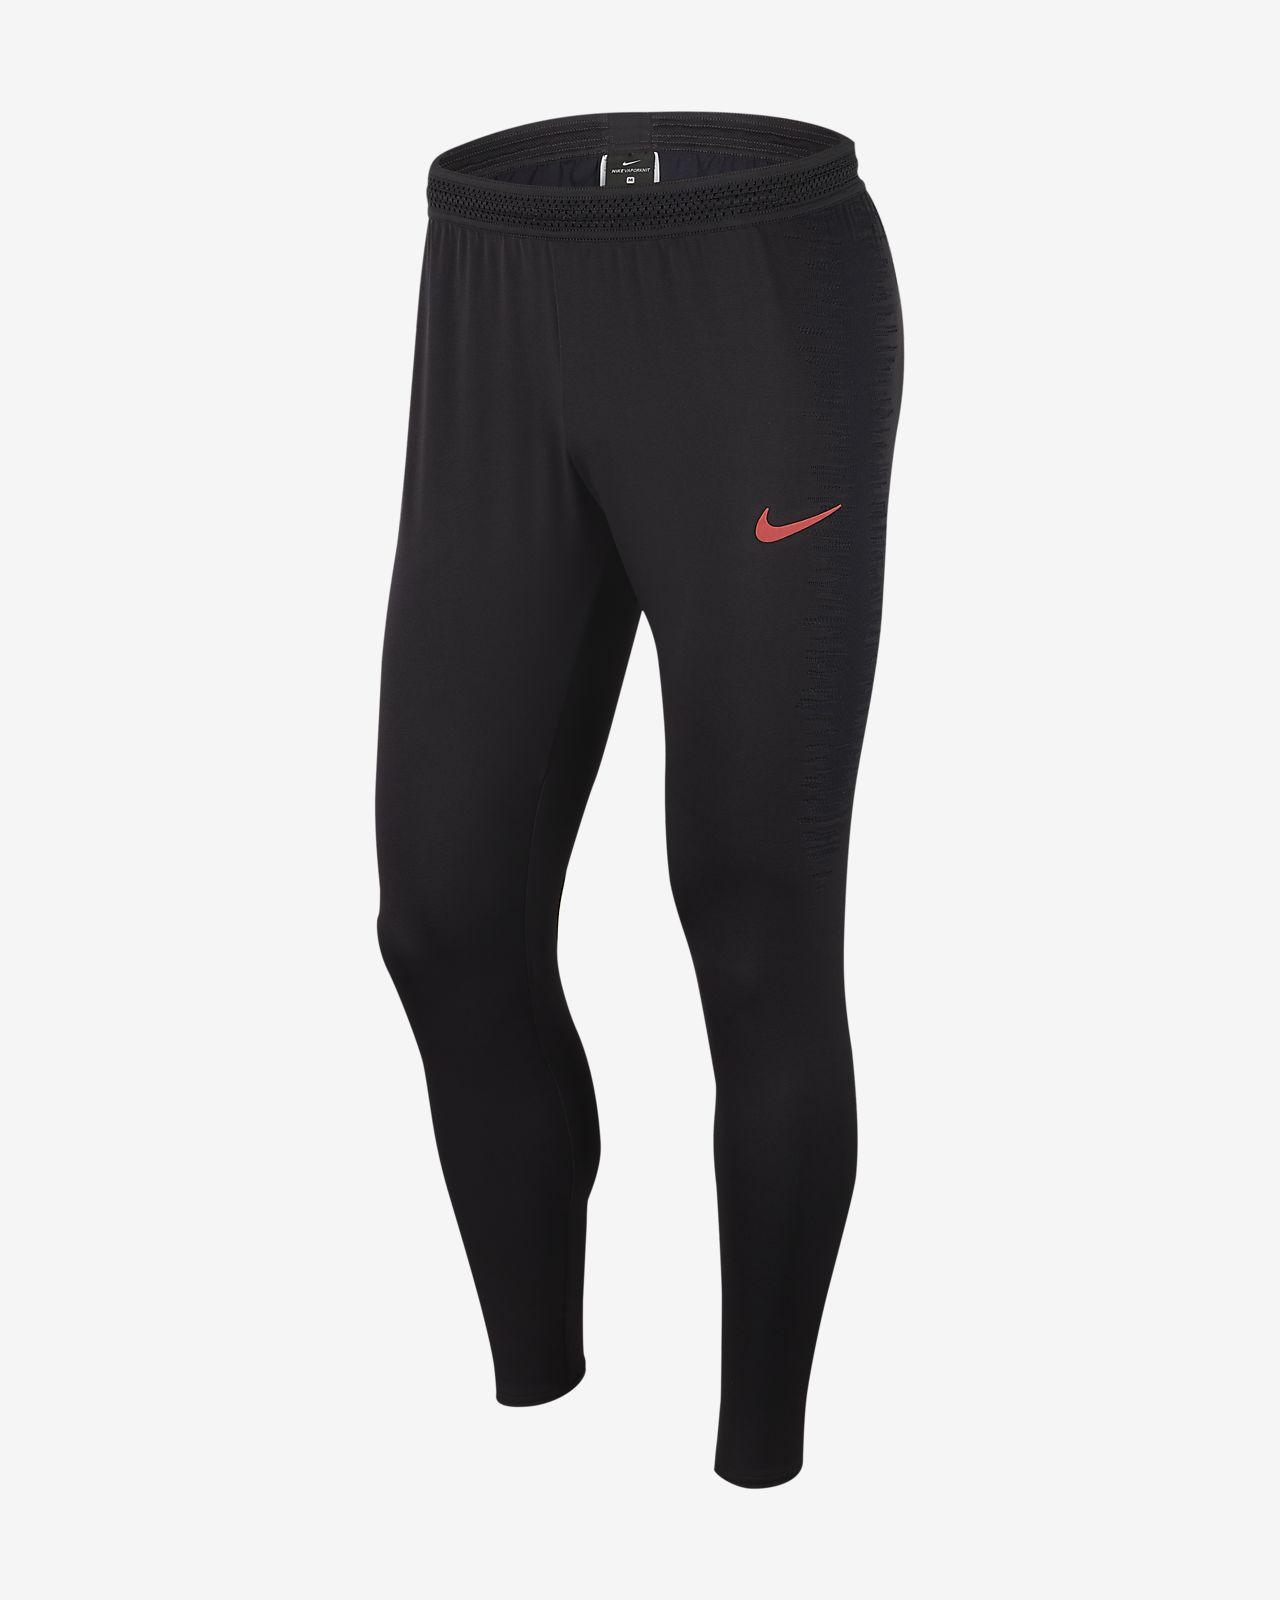 Pantalones de fútbol para hombre Paris Saint-Germain VaporKnit Strike